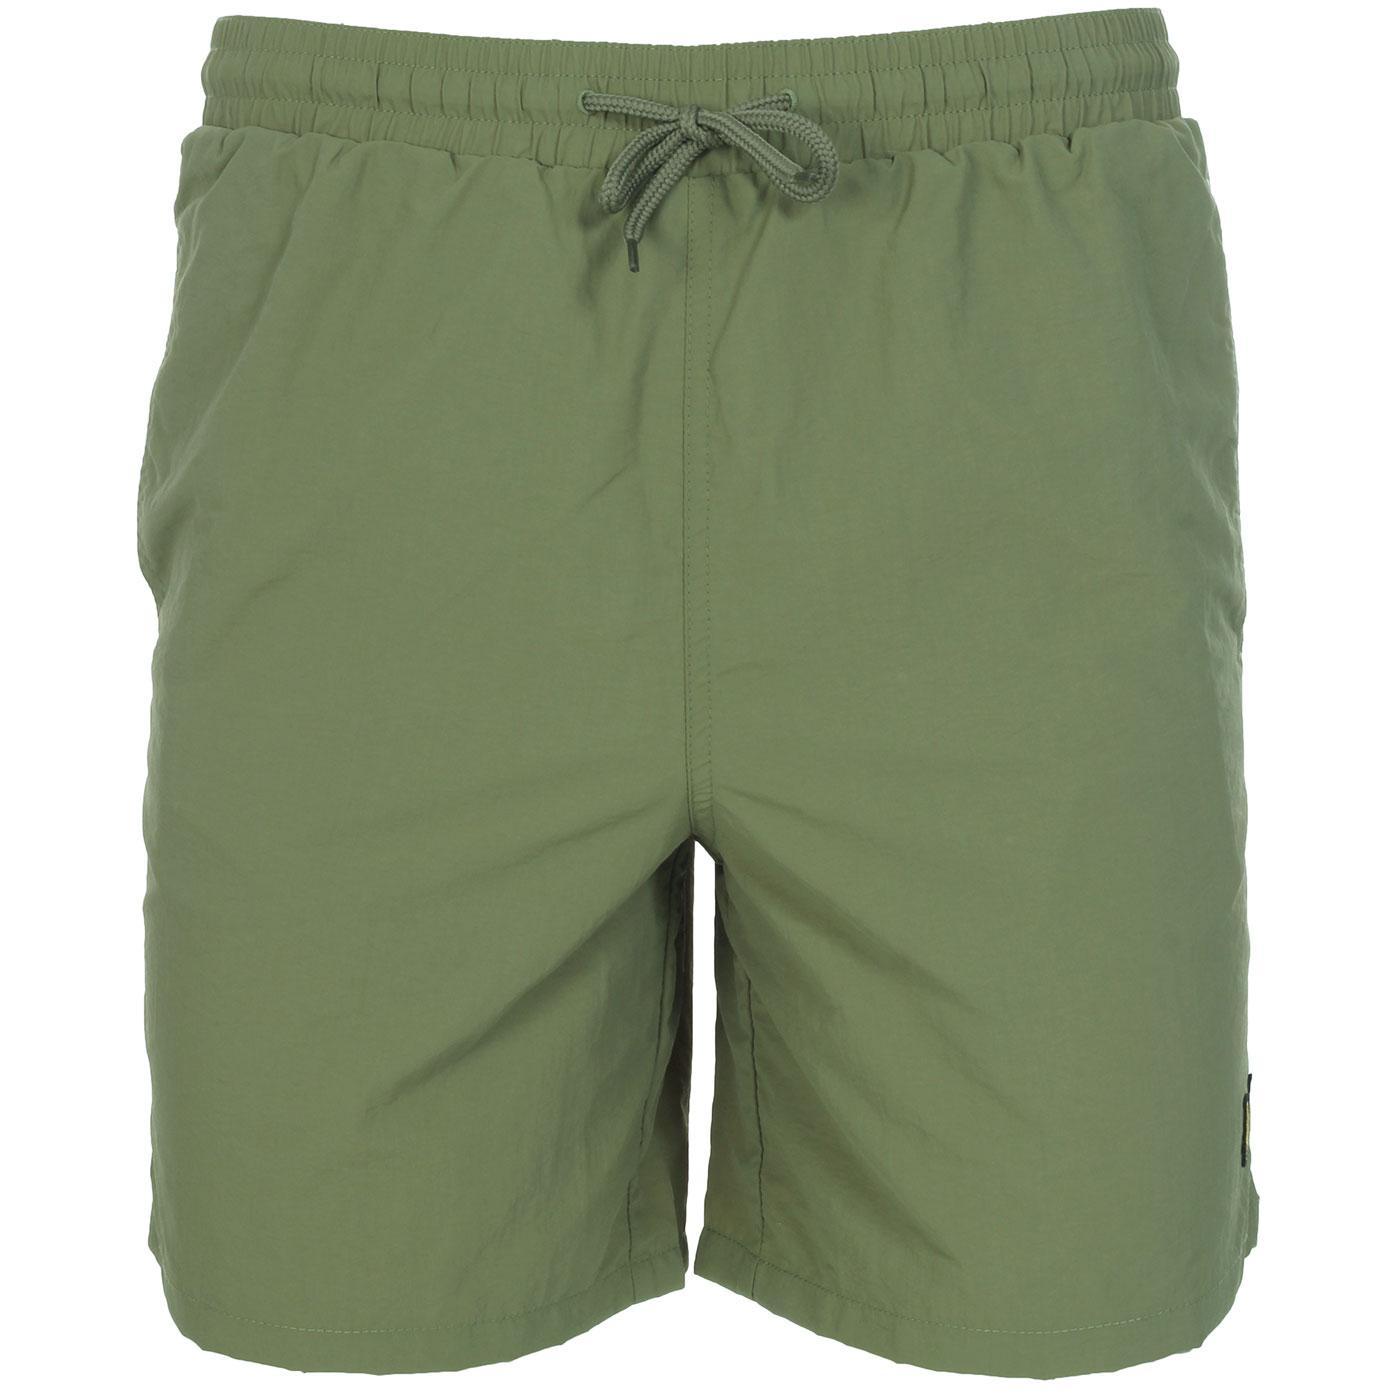 LYLE & SCOTT Men's Plain Retro Swim Shorts (Moss)